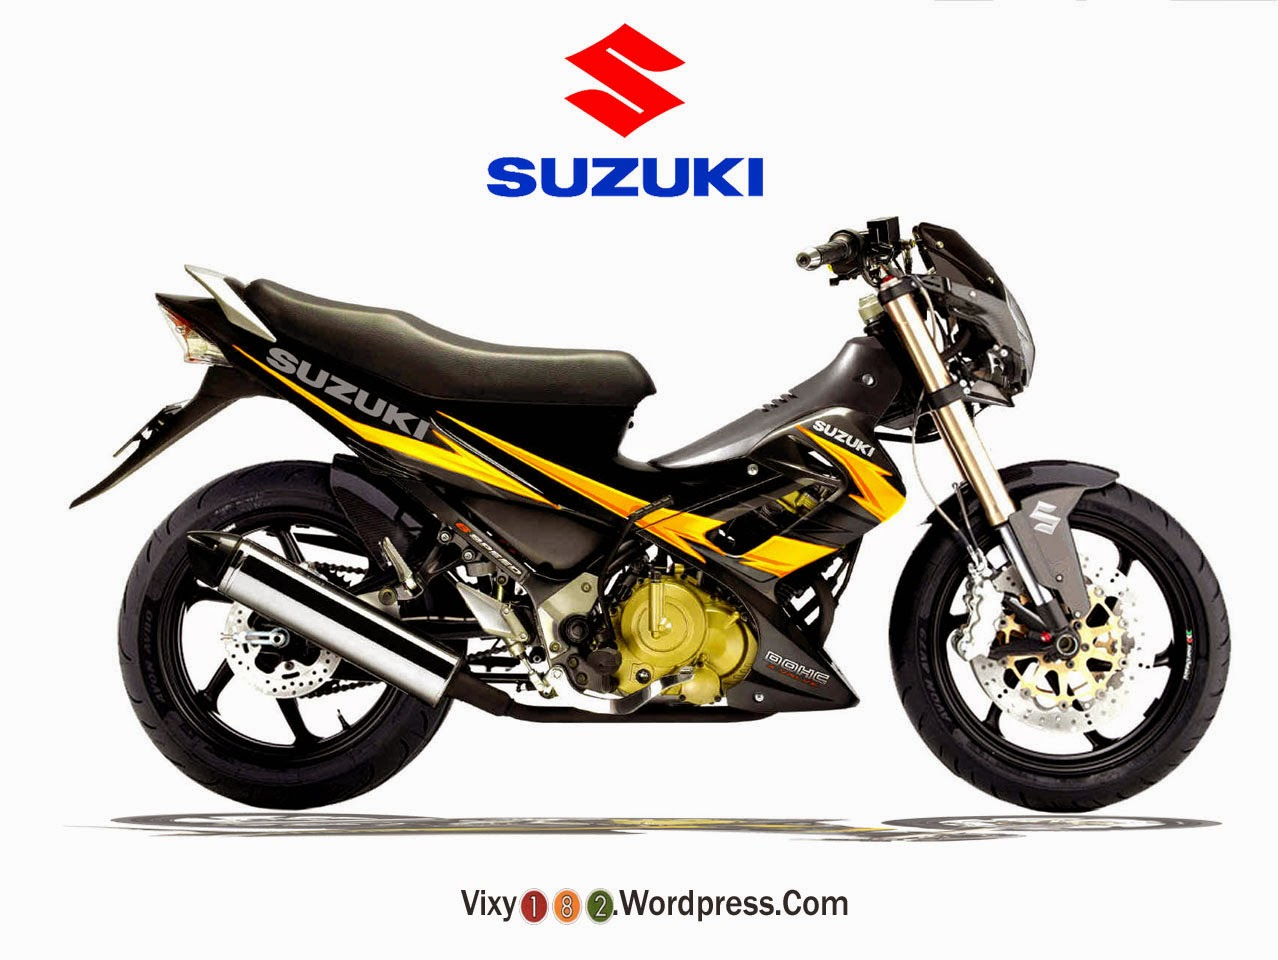 Suzuki Satria F150 Modifikasi